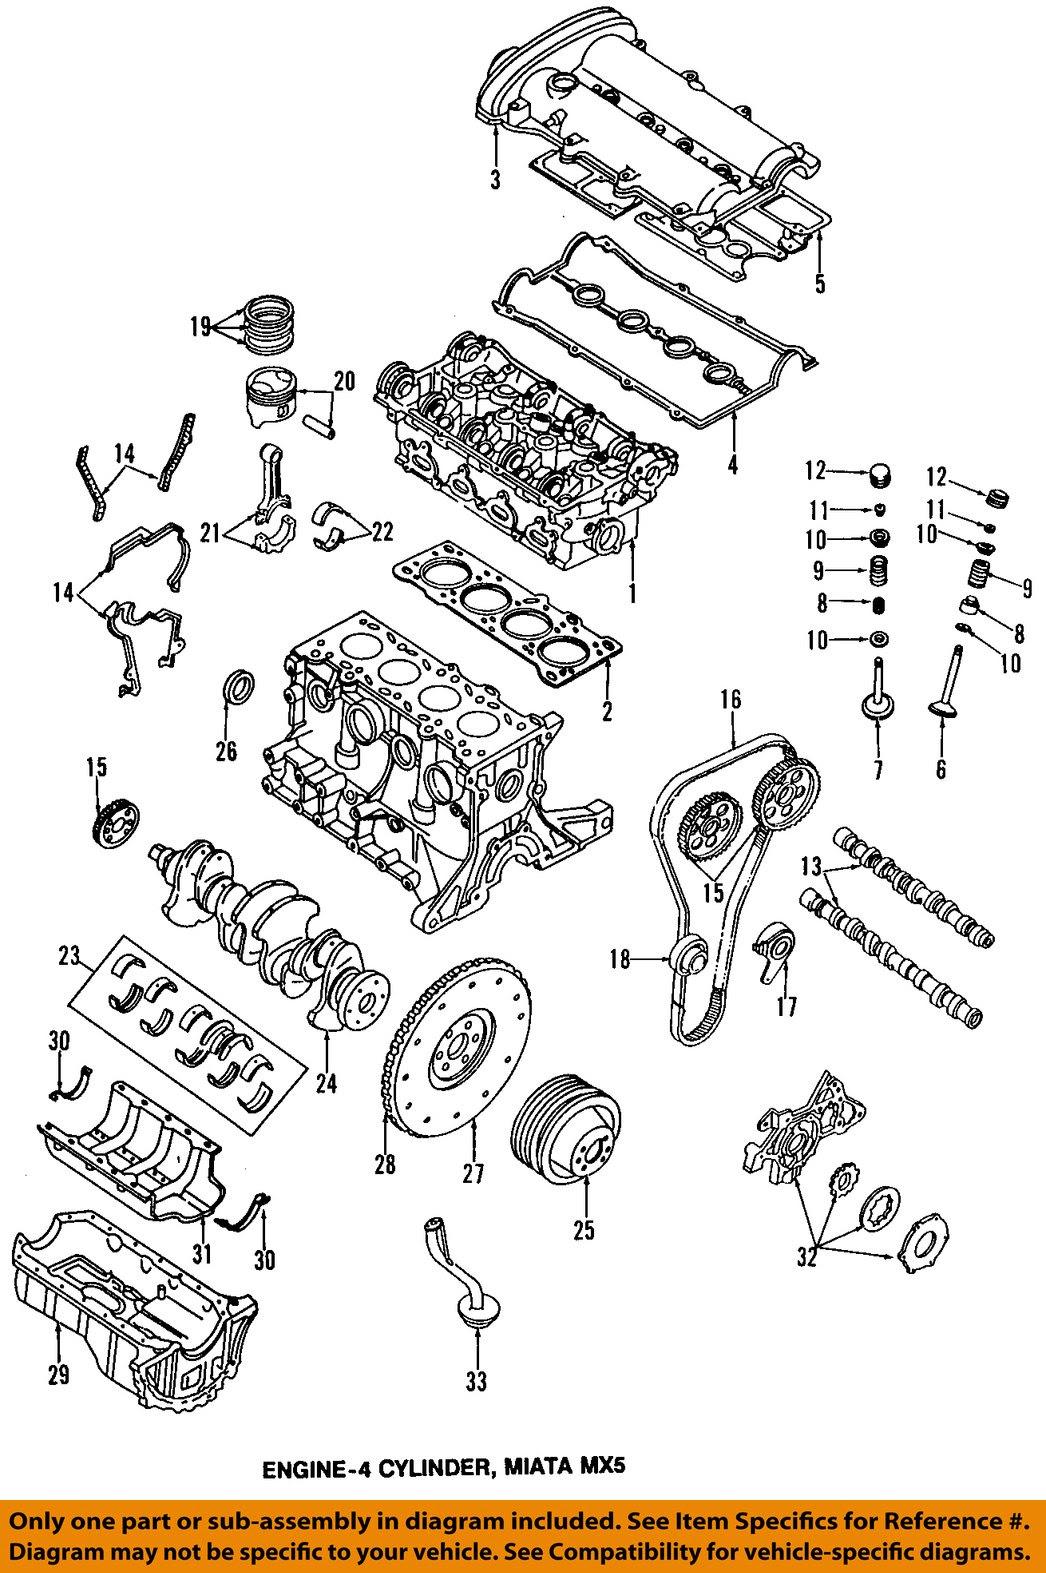 Be846d 1992 Mazda Miata Fuse Box Diagram Wiring Library